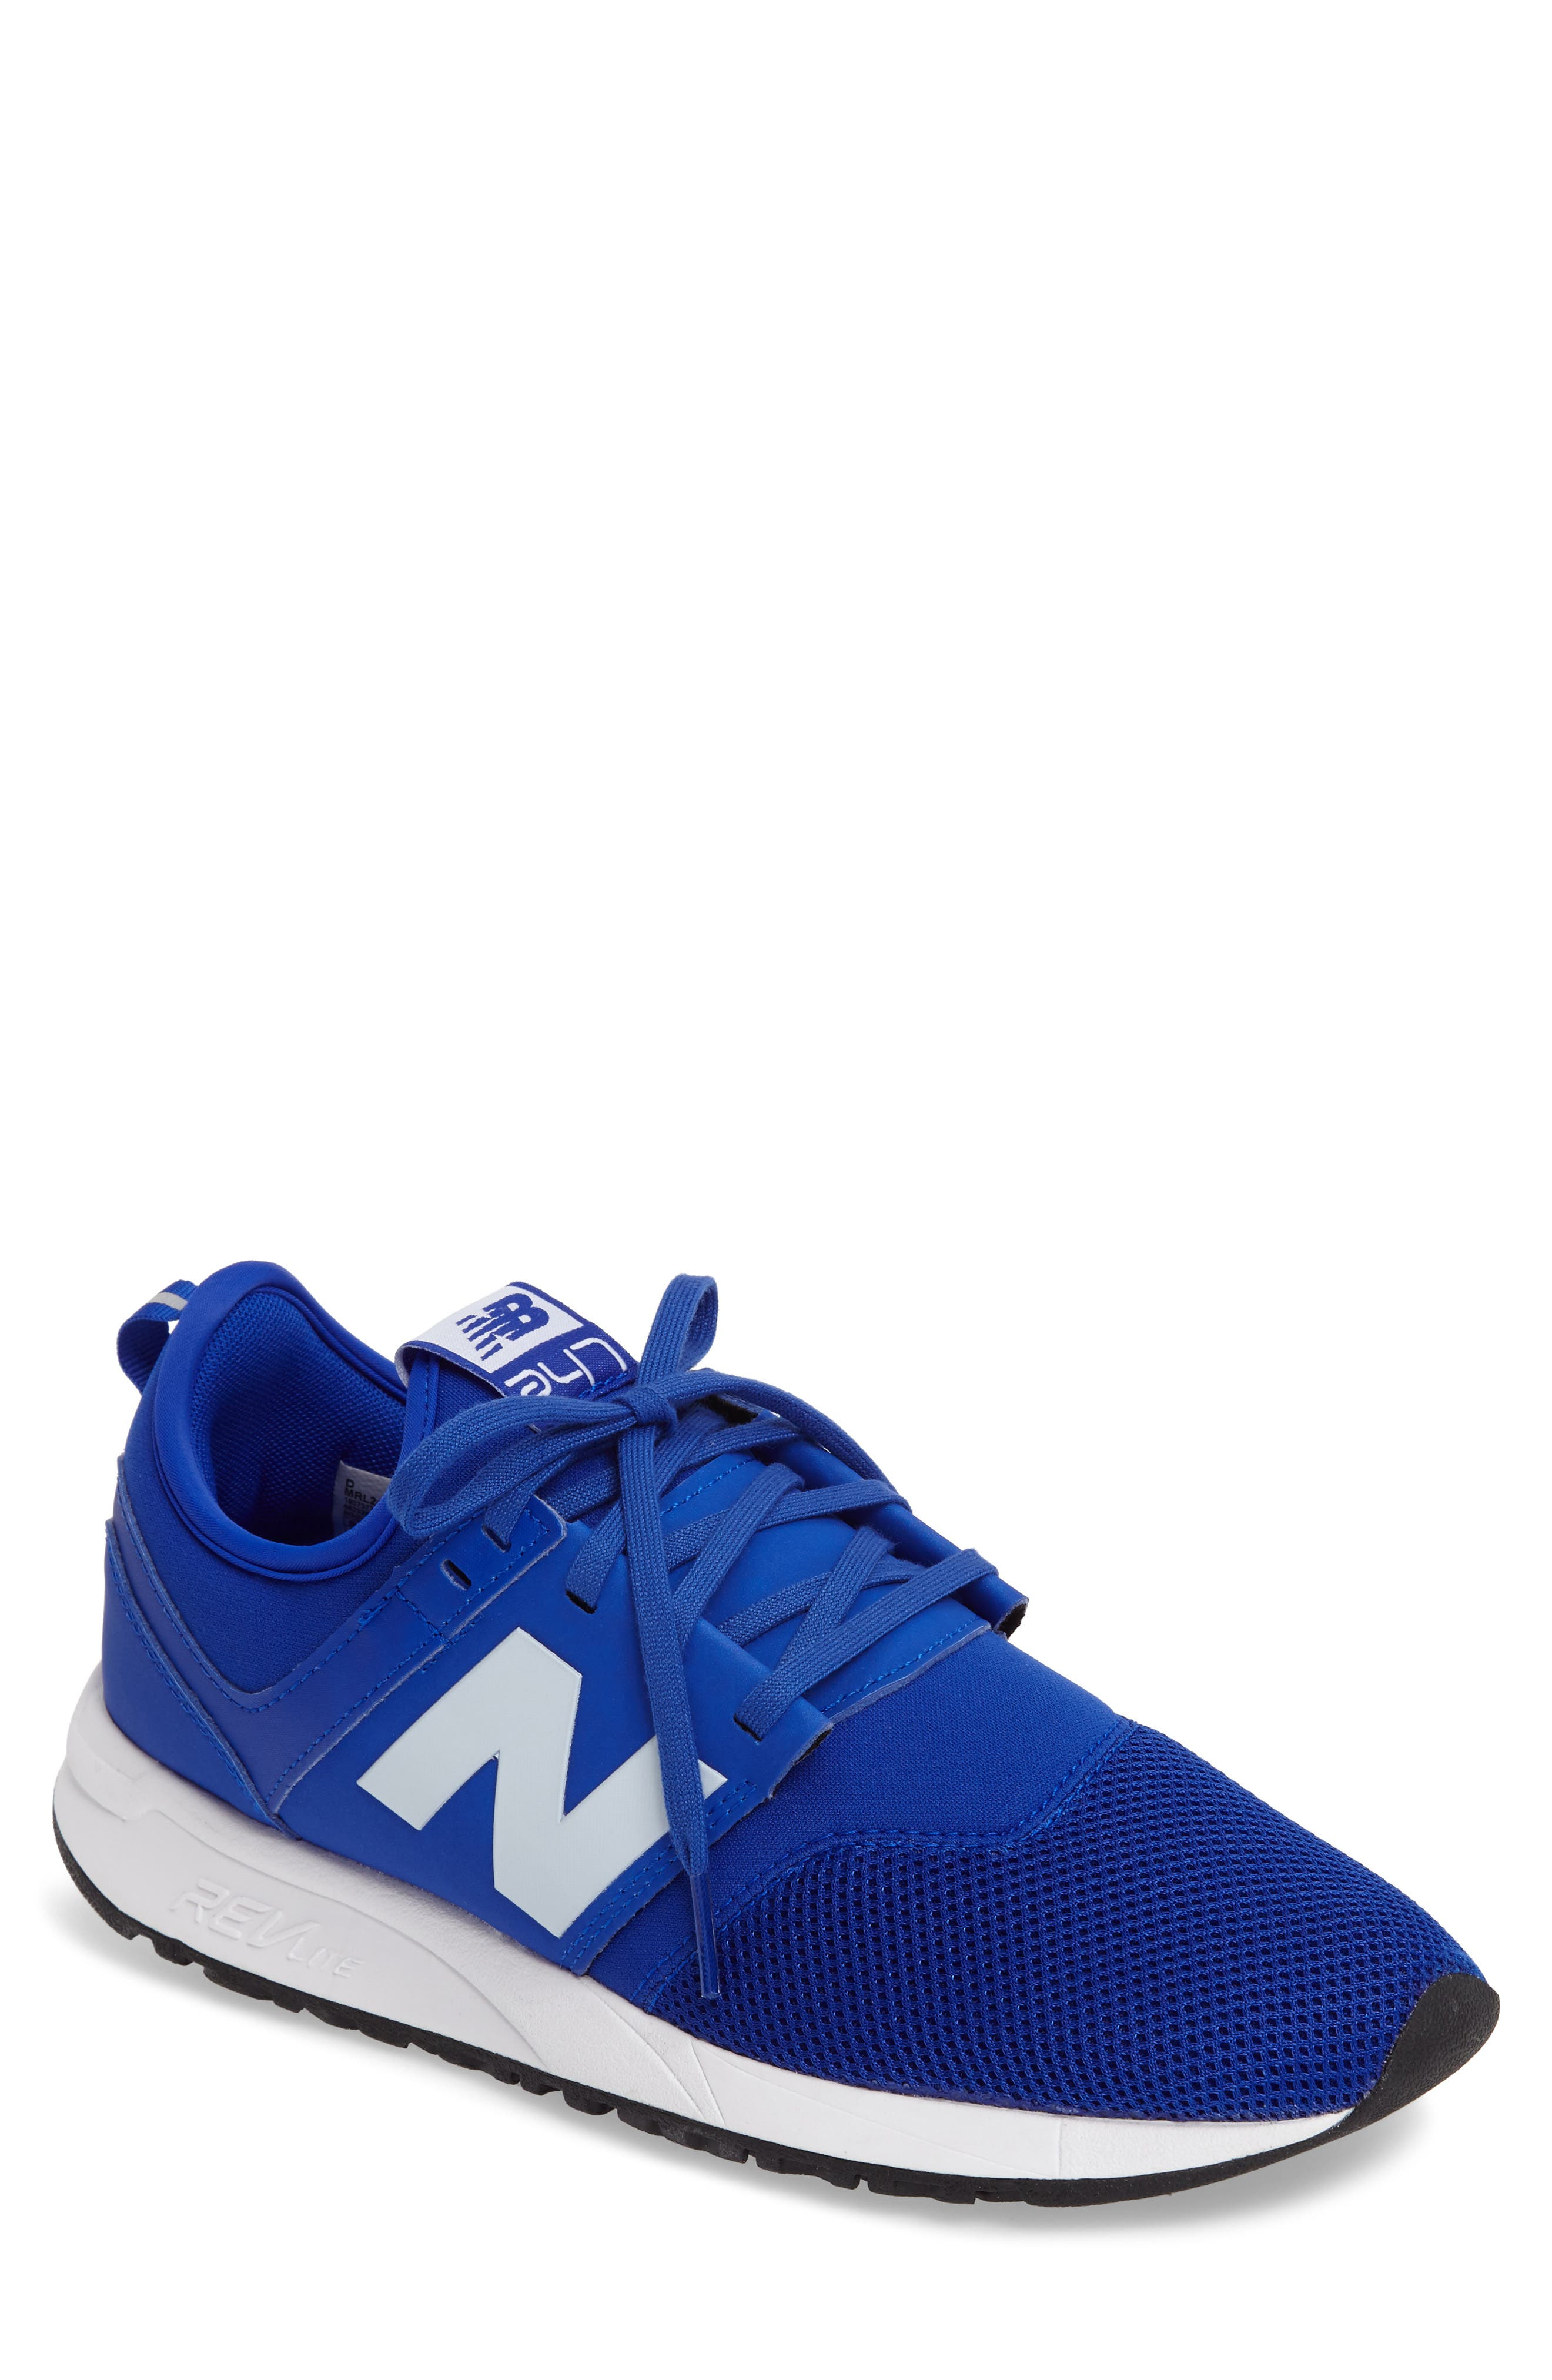 new balance 247 men blue